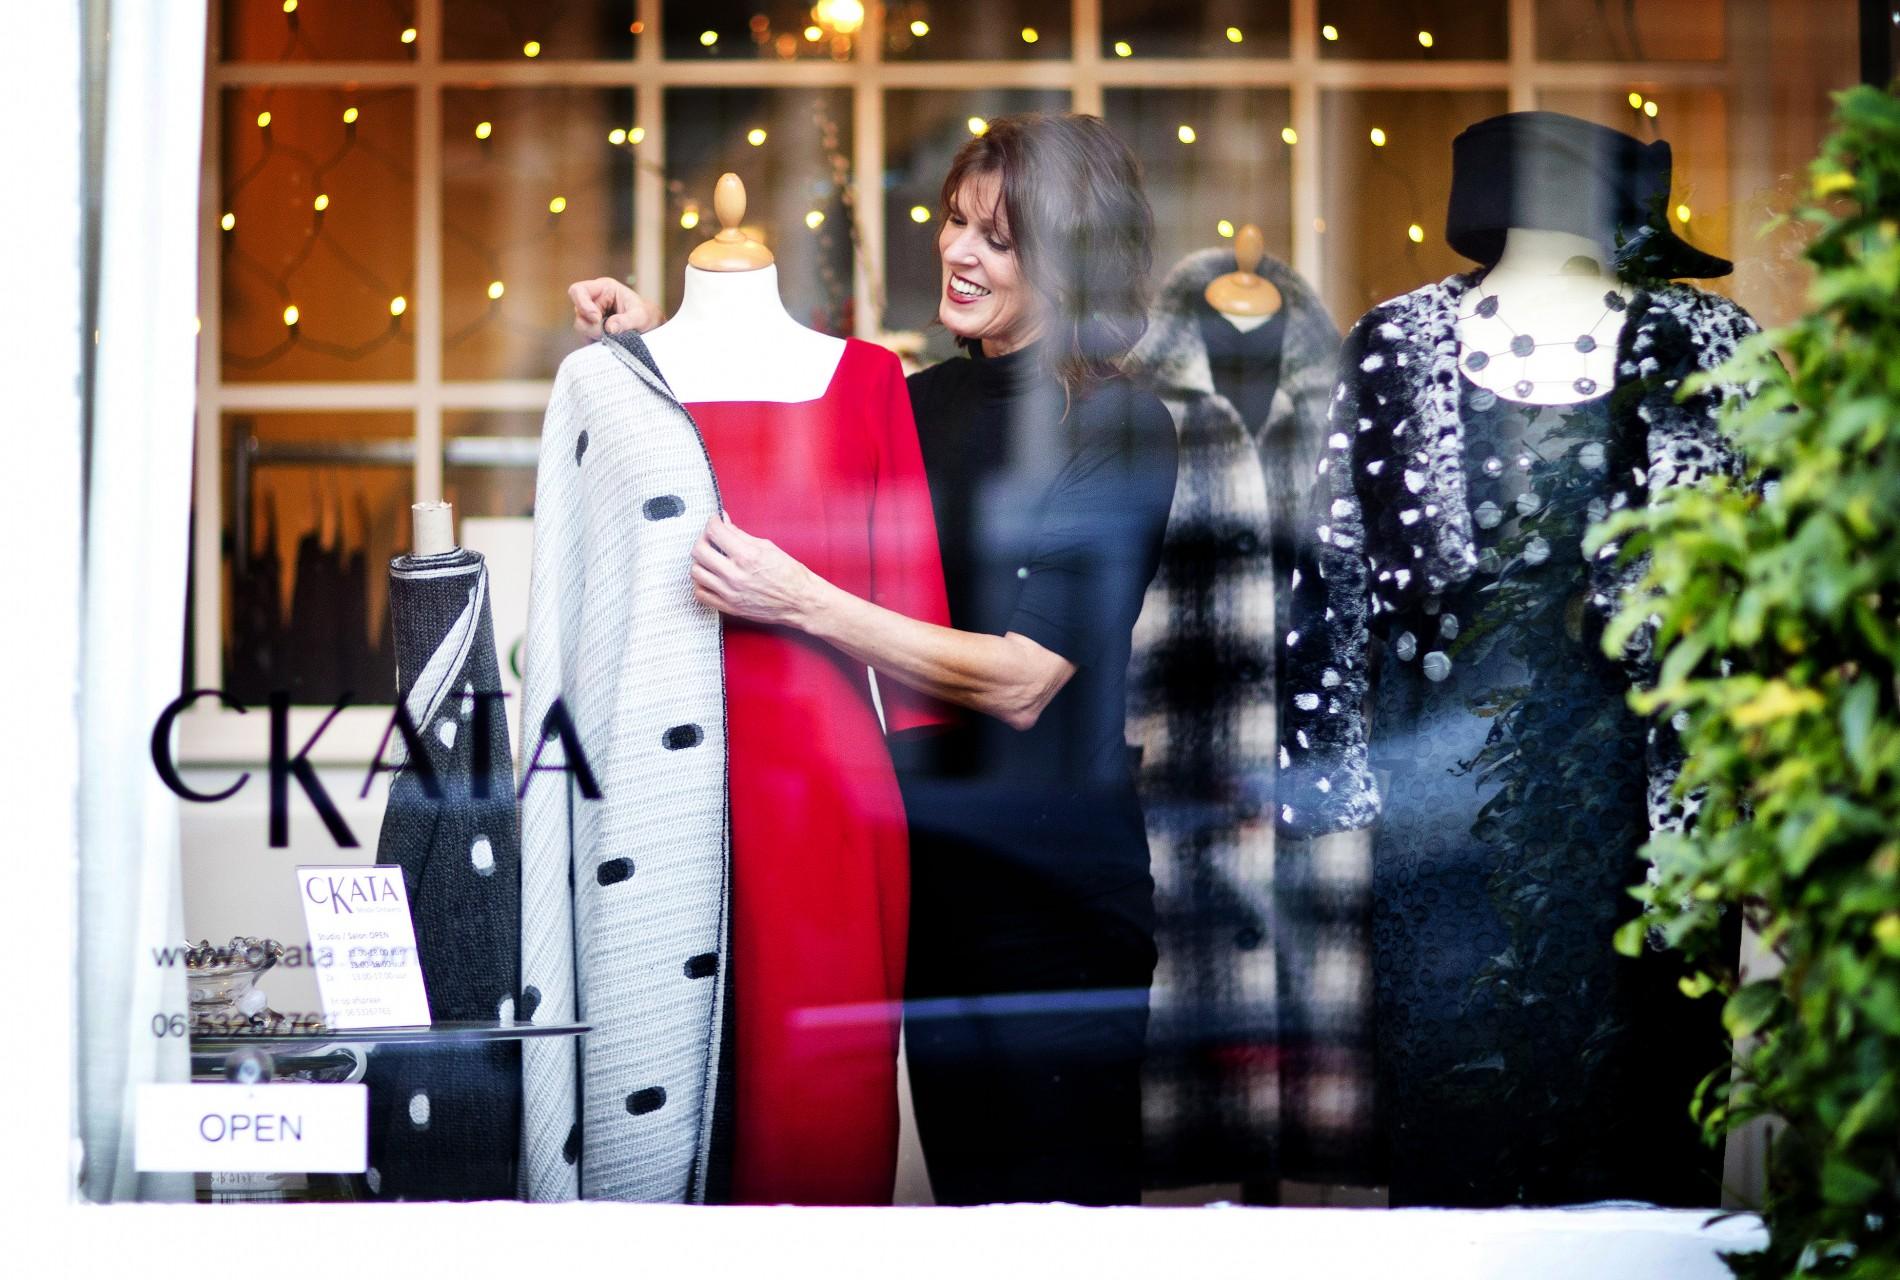 De Delftse modeontwerpster Mieke van der Schans